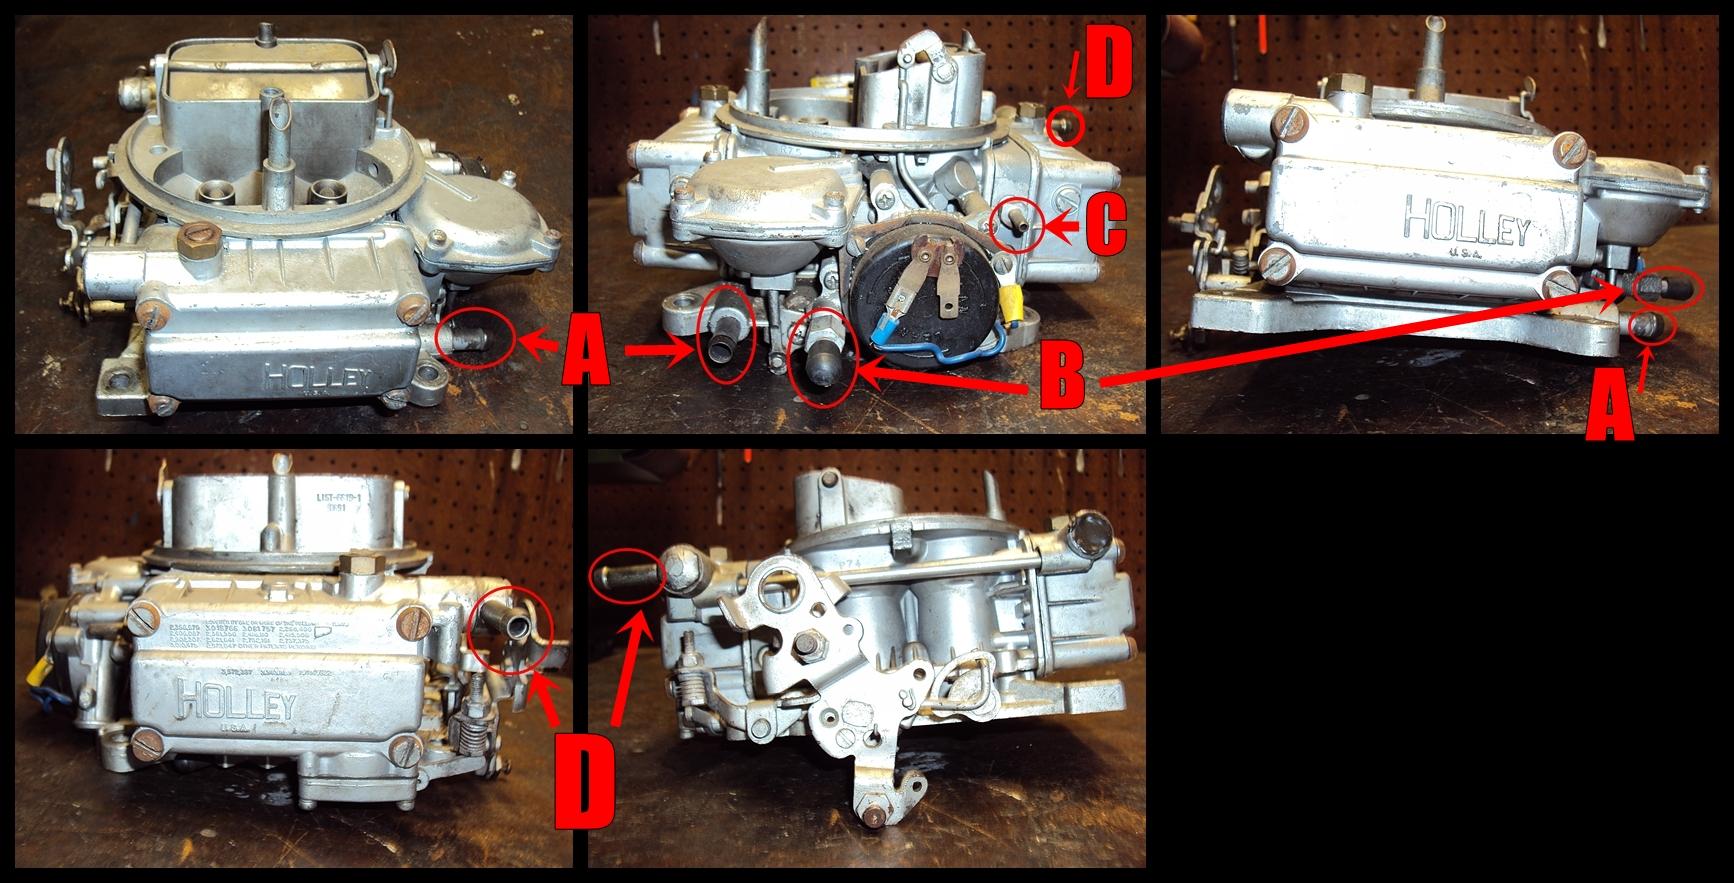 Holley 4160600 cfm carburetor components identification hot holley 4160600 cfm carburetor components identification pooptronica